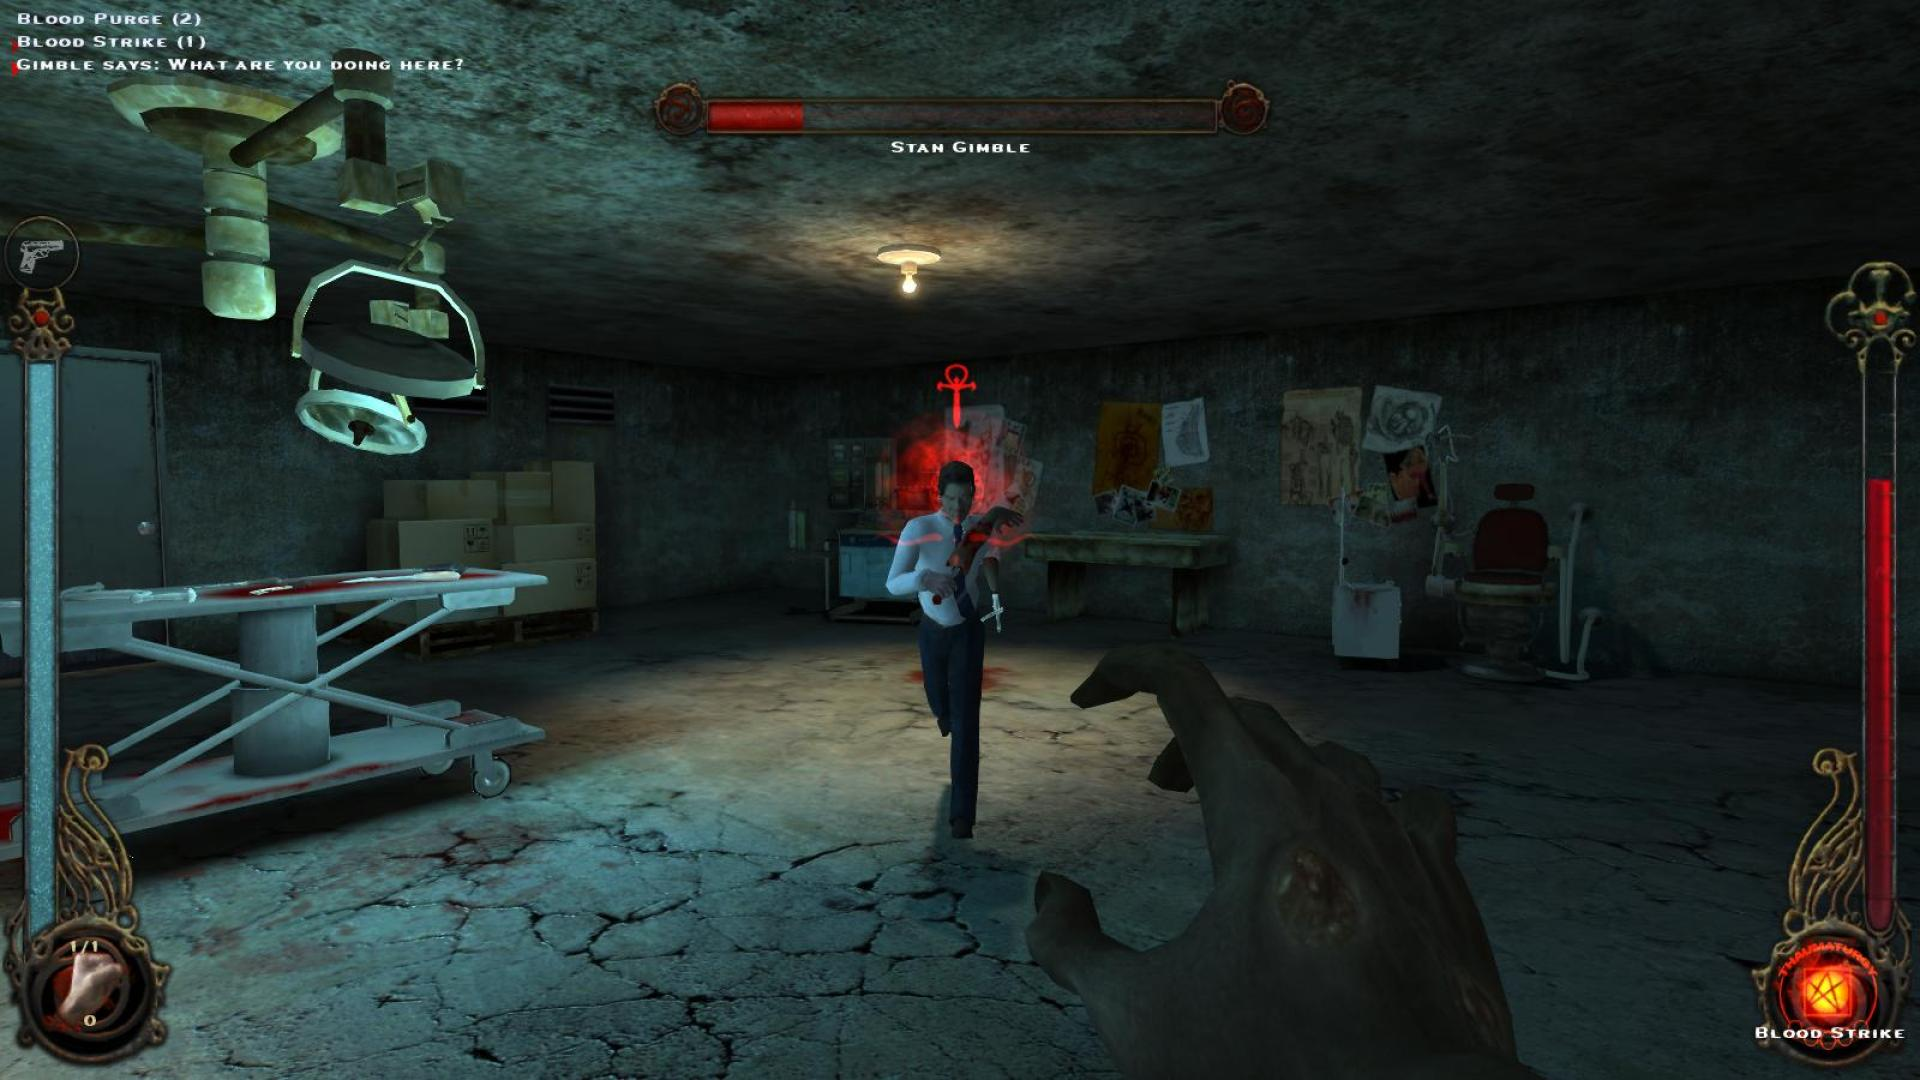 Vampire: The Masquerade - Bloodlines (2004) 6. kép